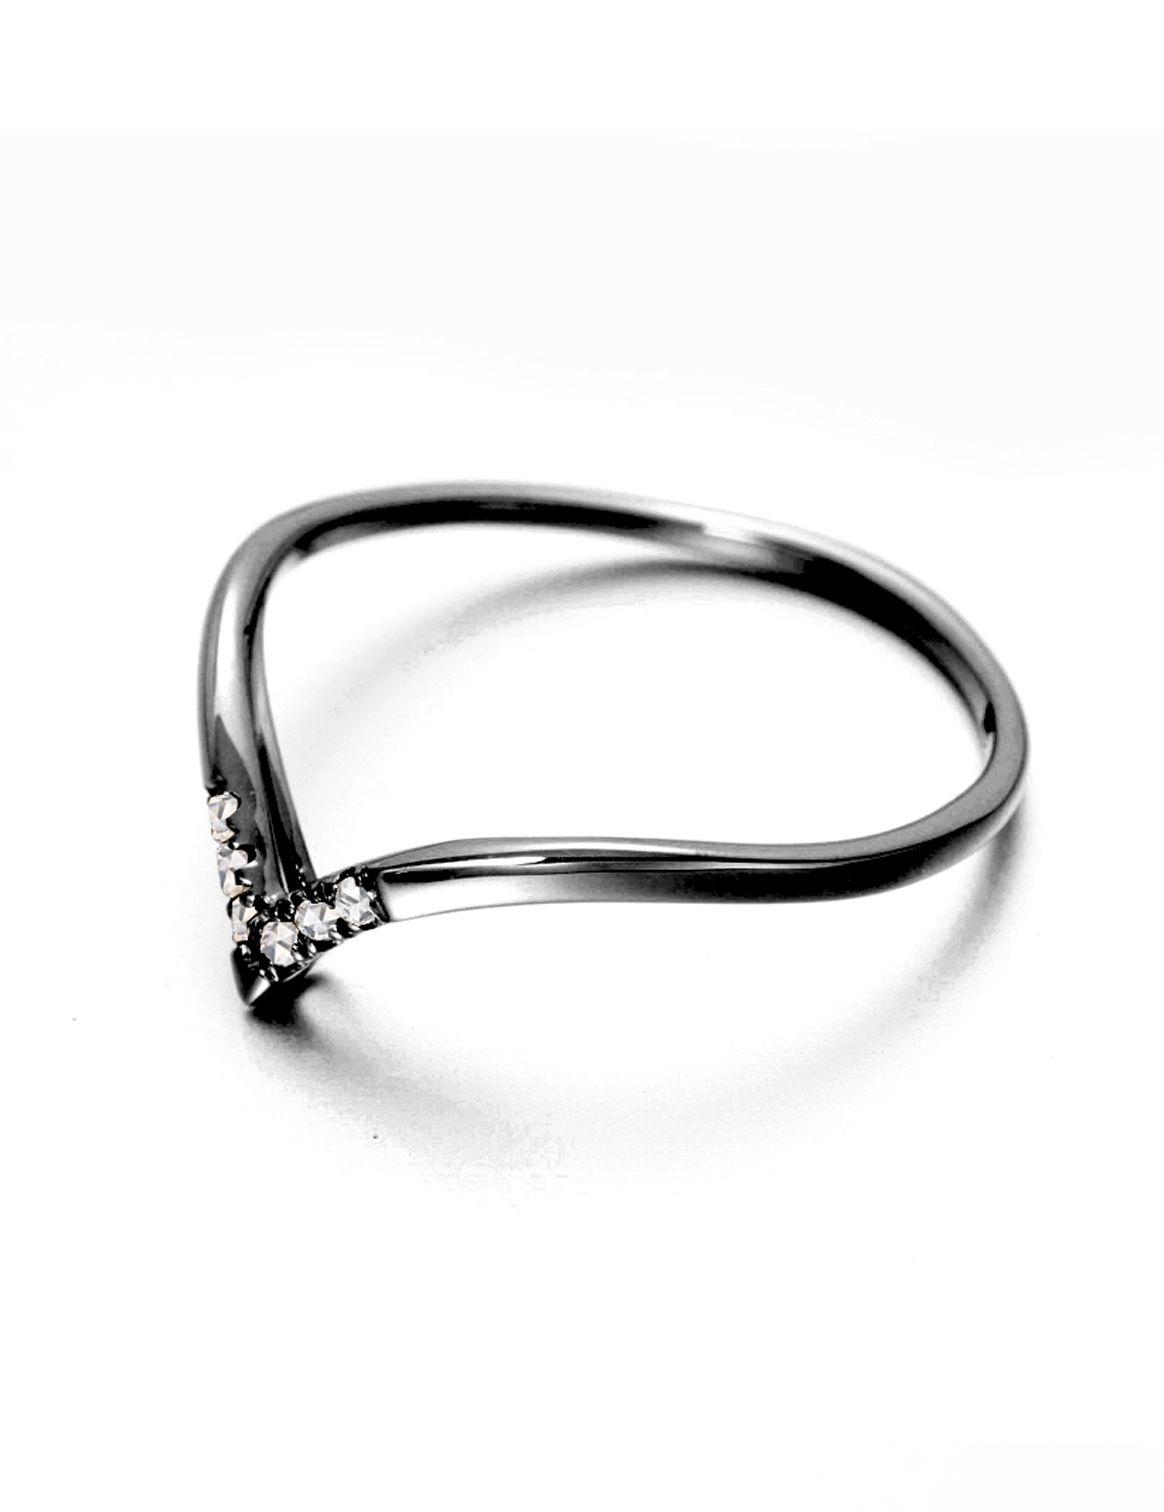 8c50e9033 Natural diamond ring for women, 14k gold black ring, Minimalist ...